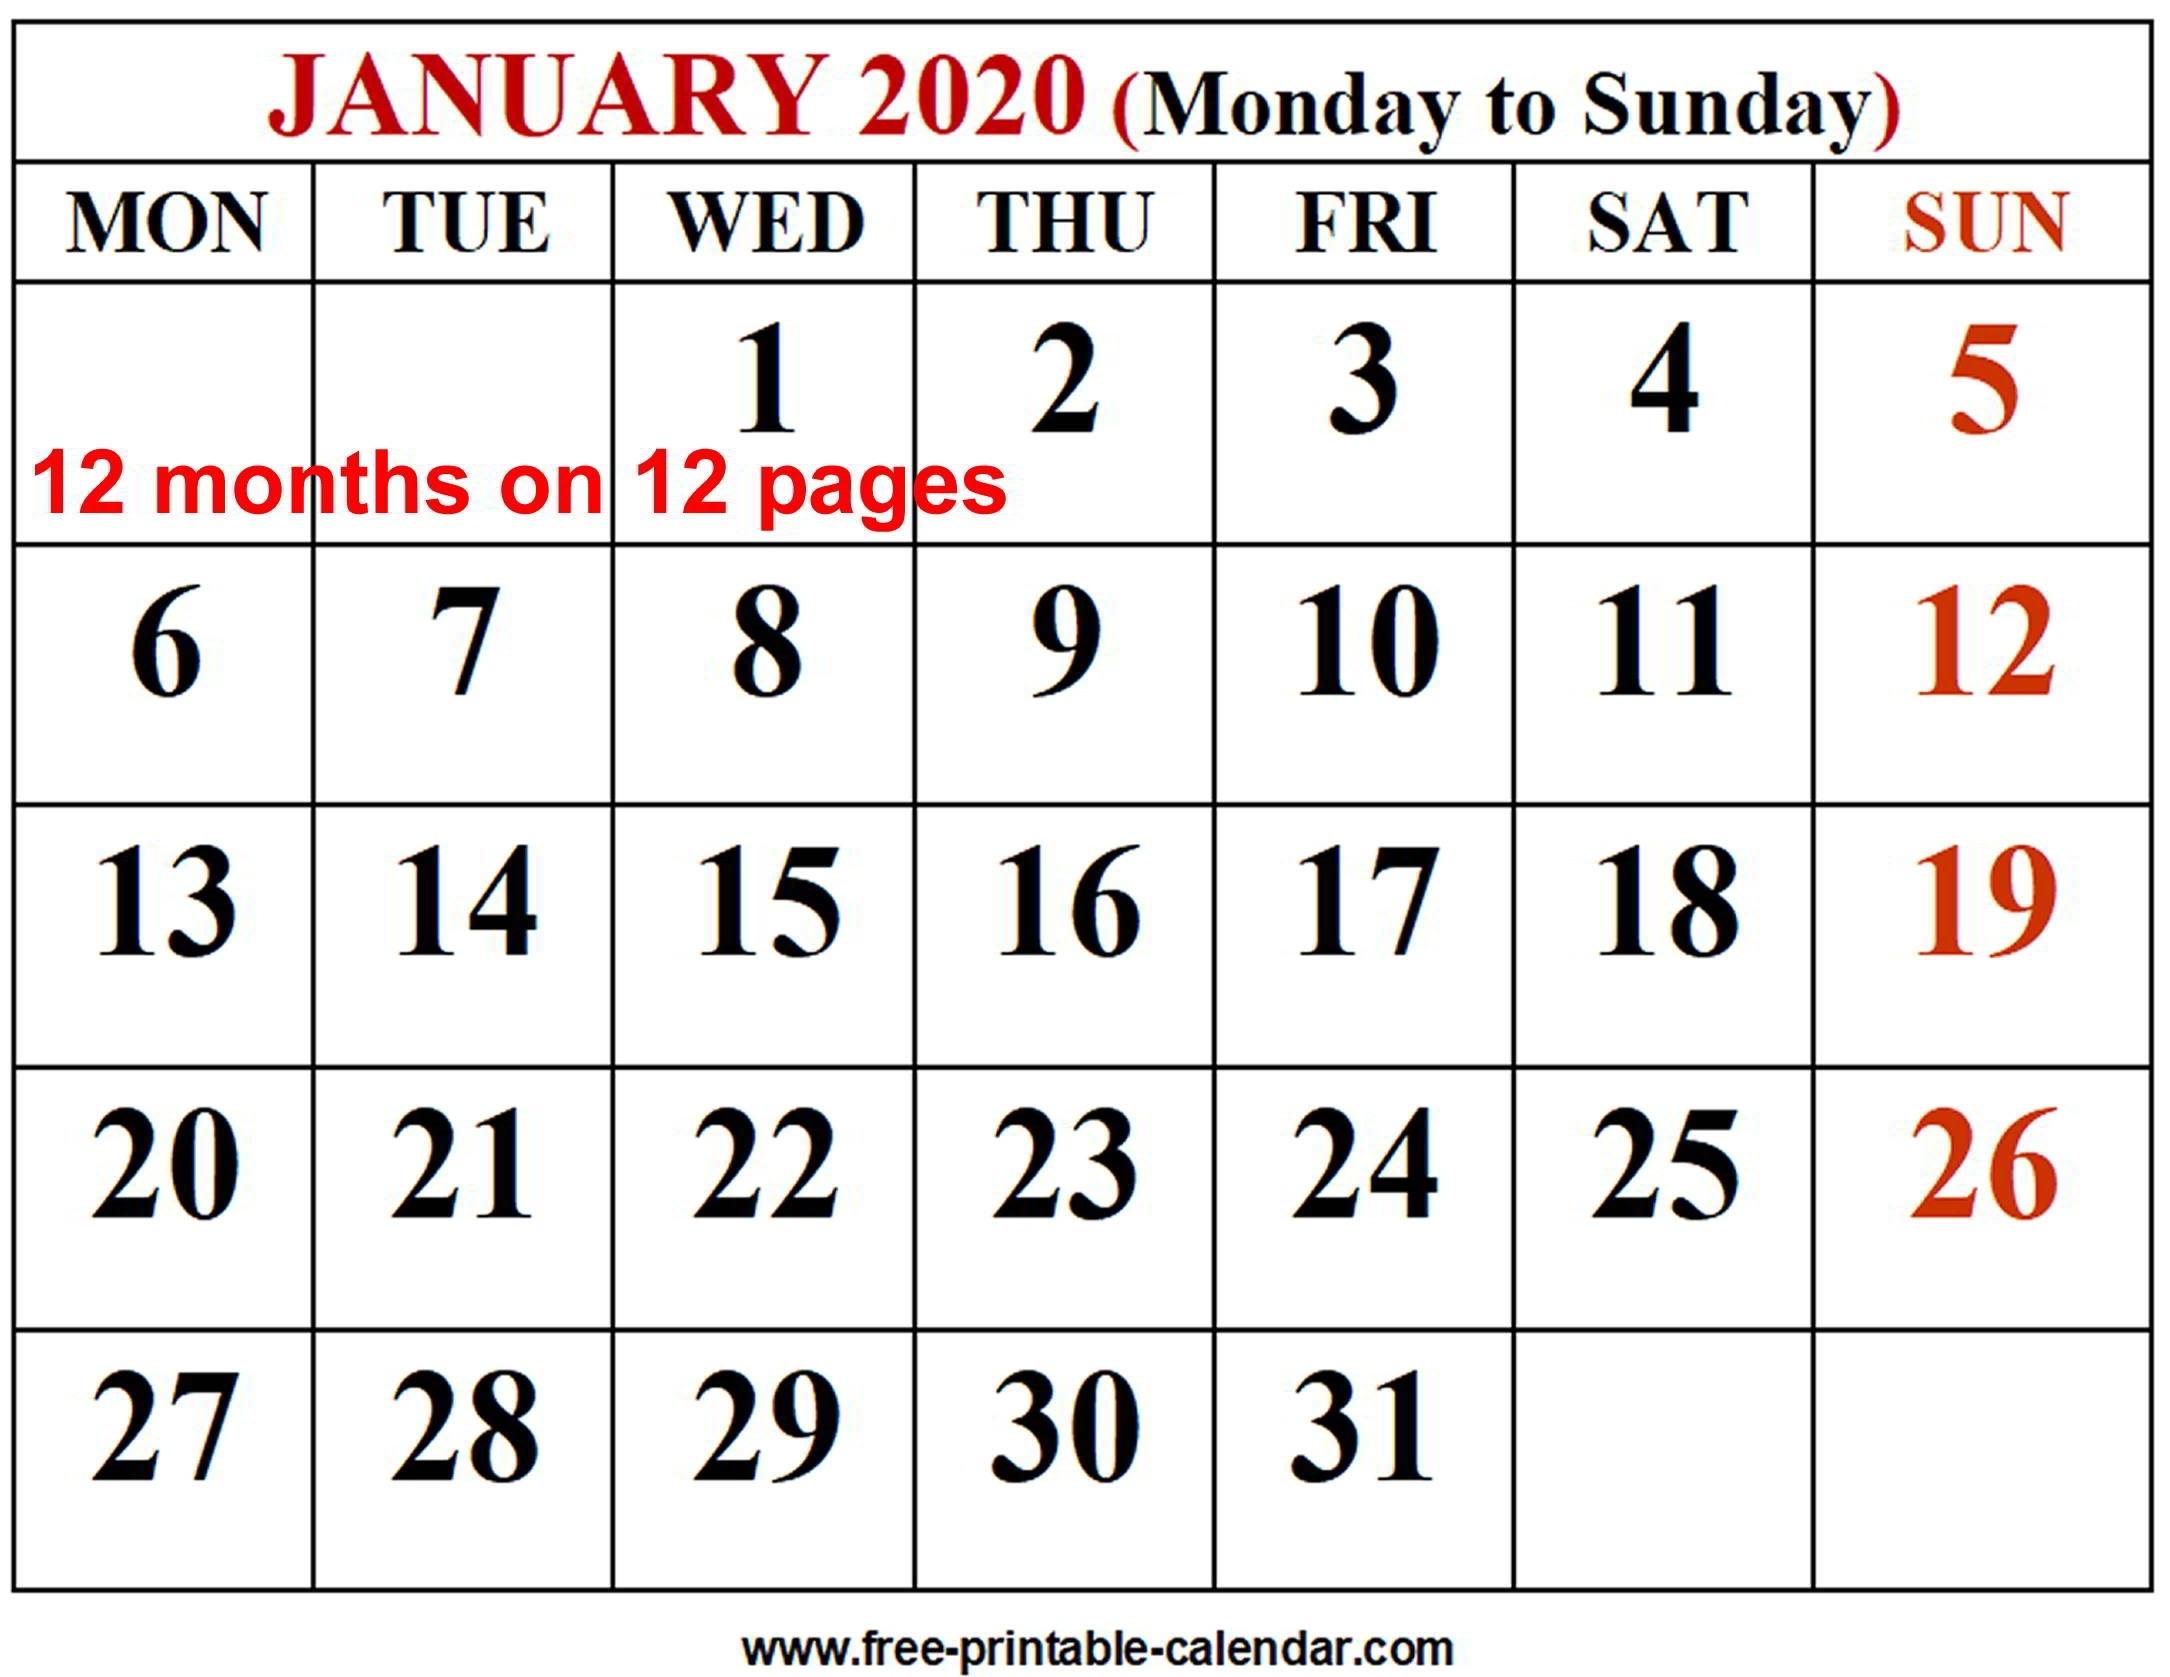 2020 Calendar Template - Free-Printable-Calendar-Microsoft Calendar Templates 2020